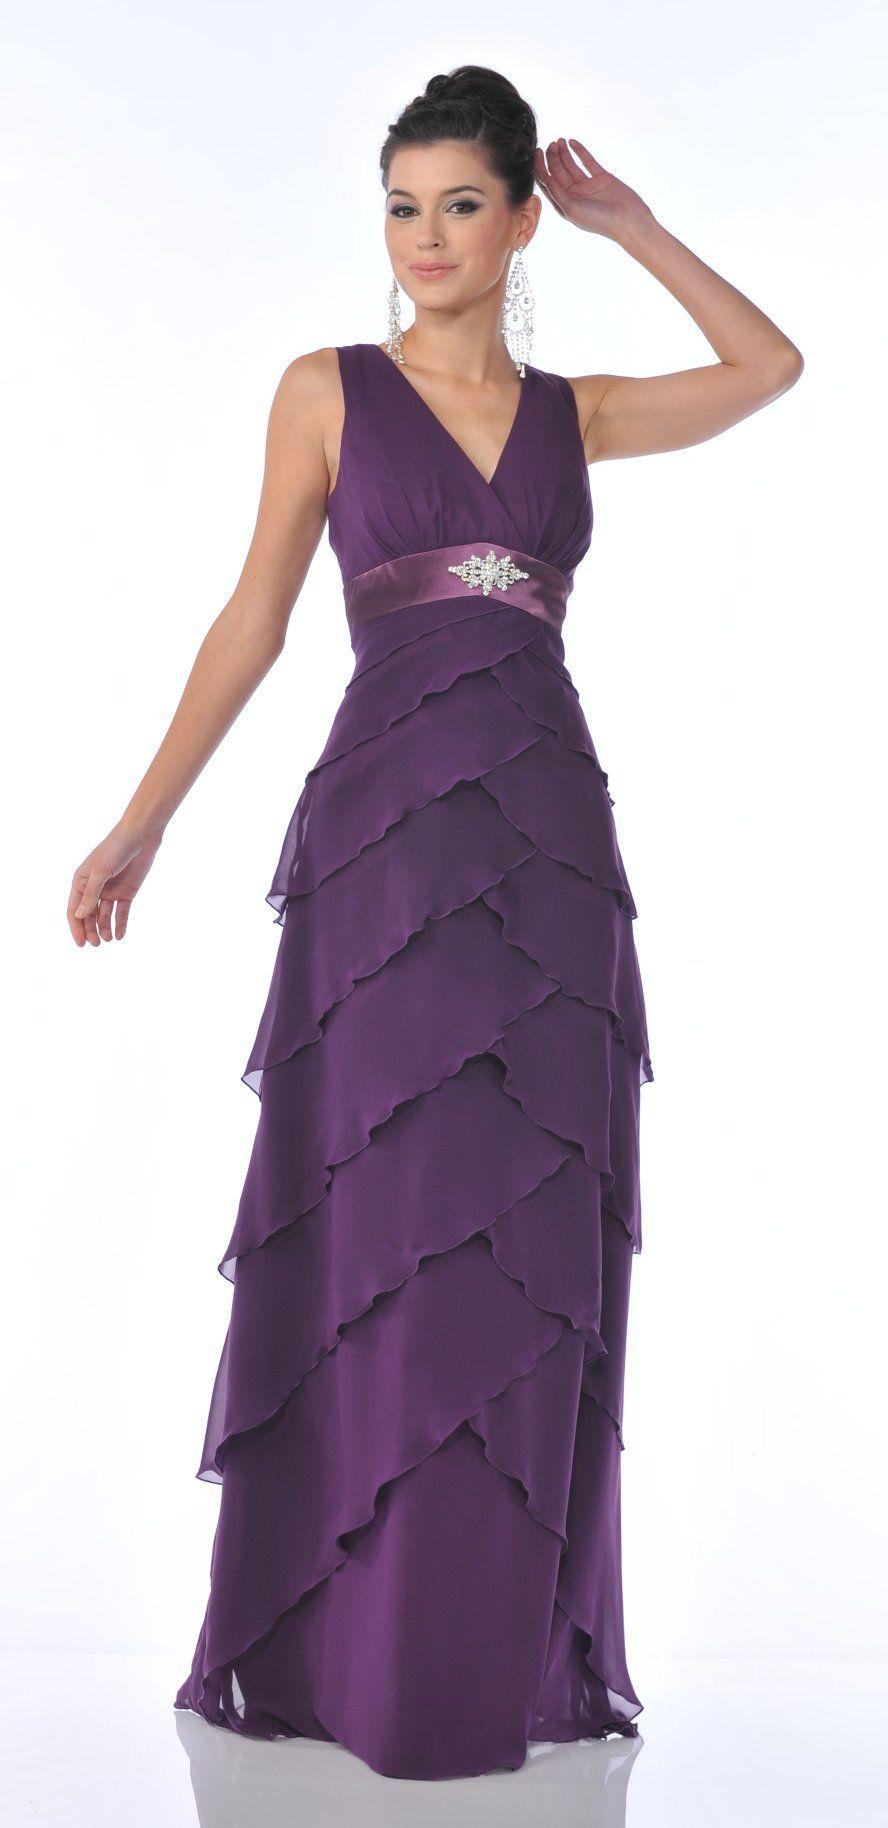 V Neck Eggplant Formal Evening Dress Tiered Layer Skirt Wide Straps ...